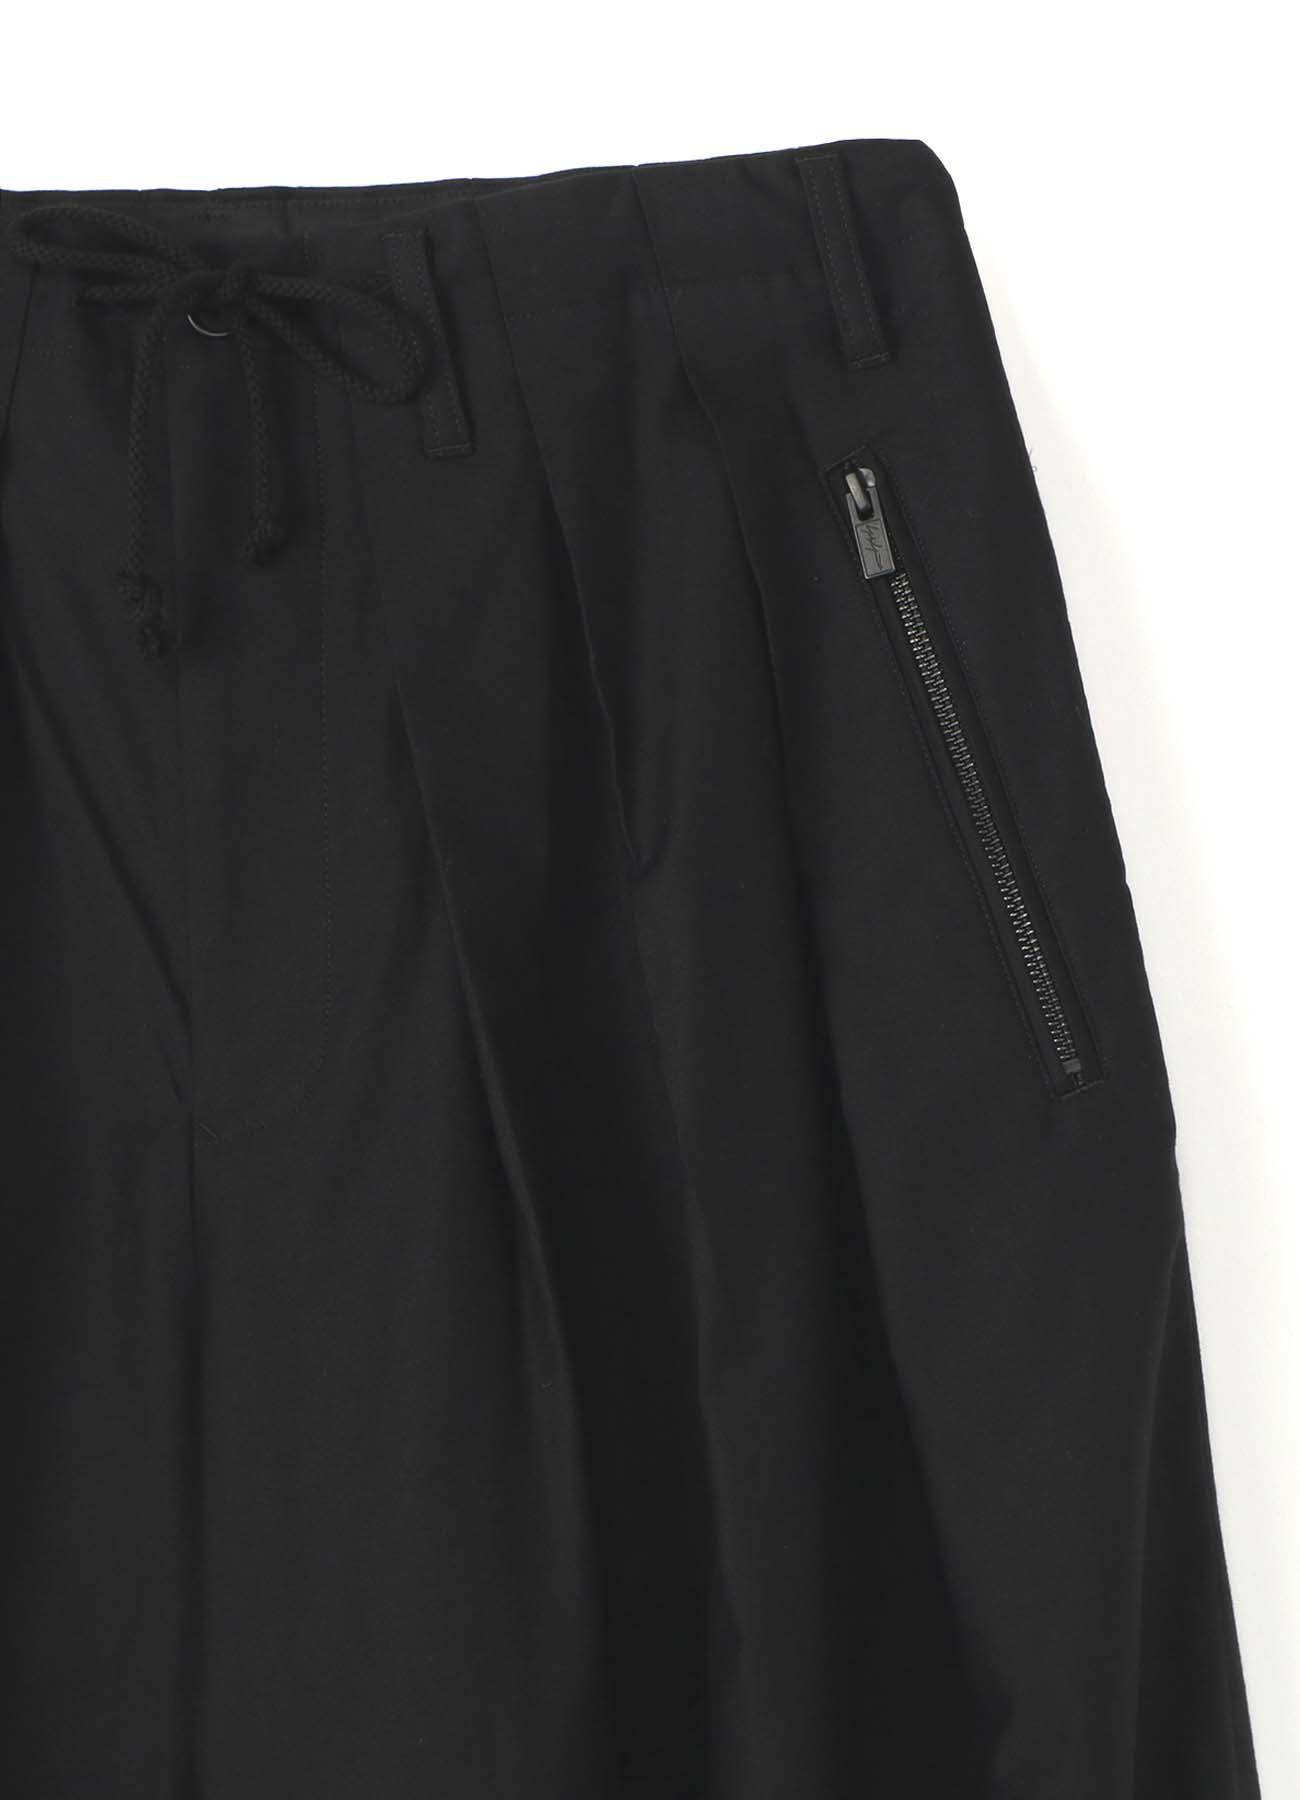 BLACK Scandal刺繍ツイル バルーンパンツ